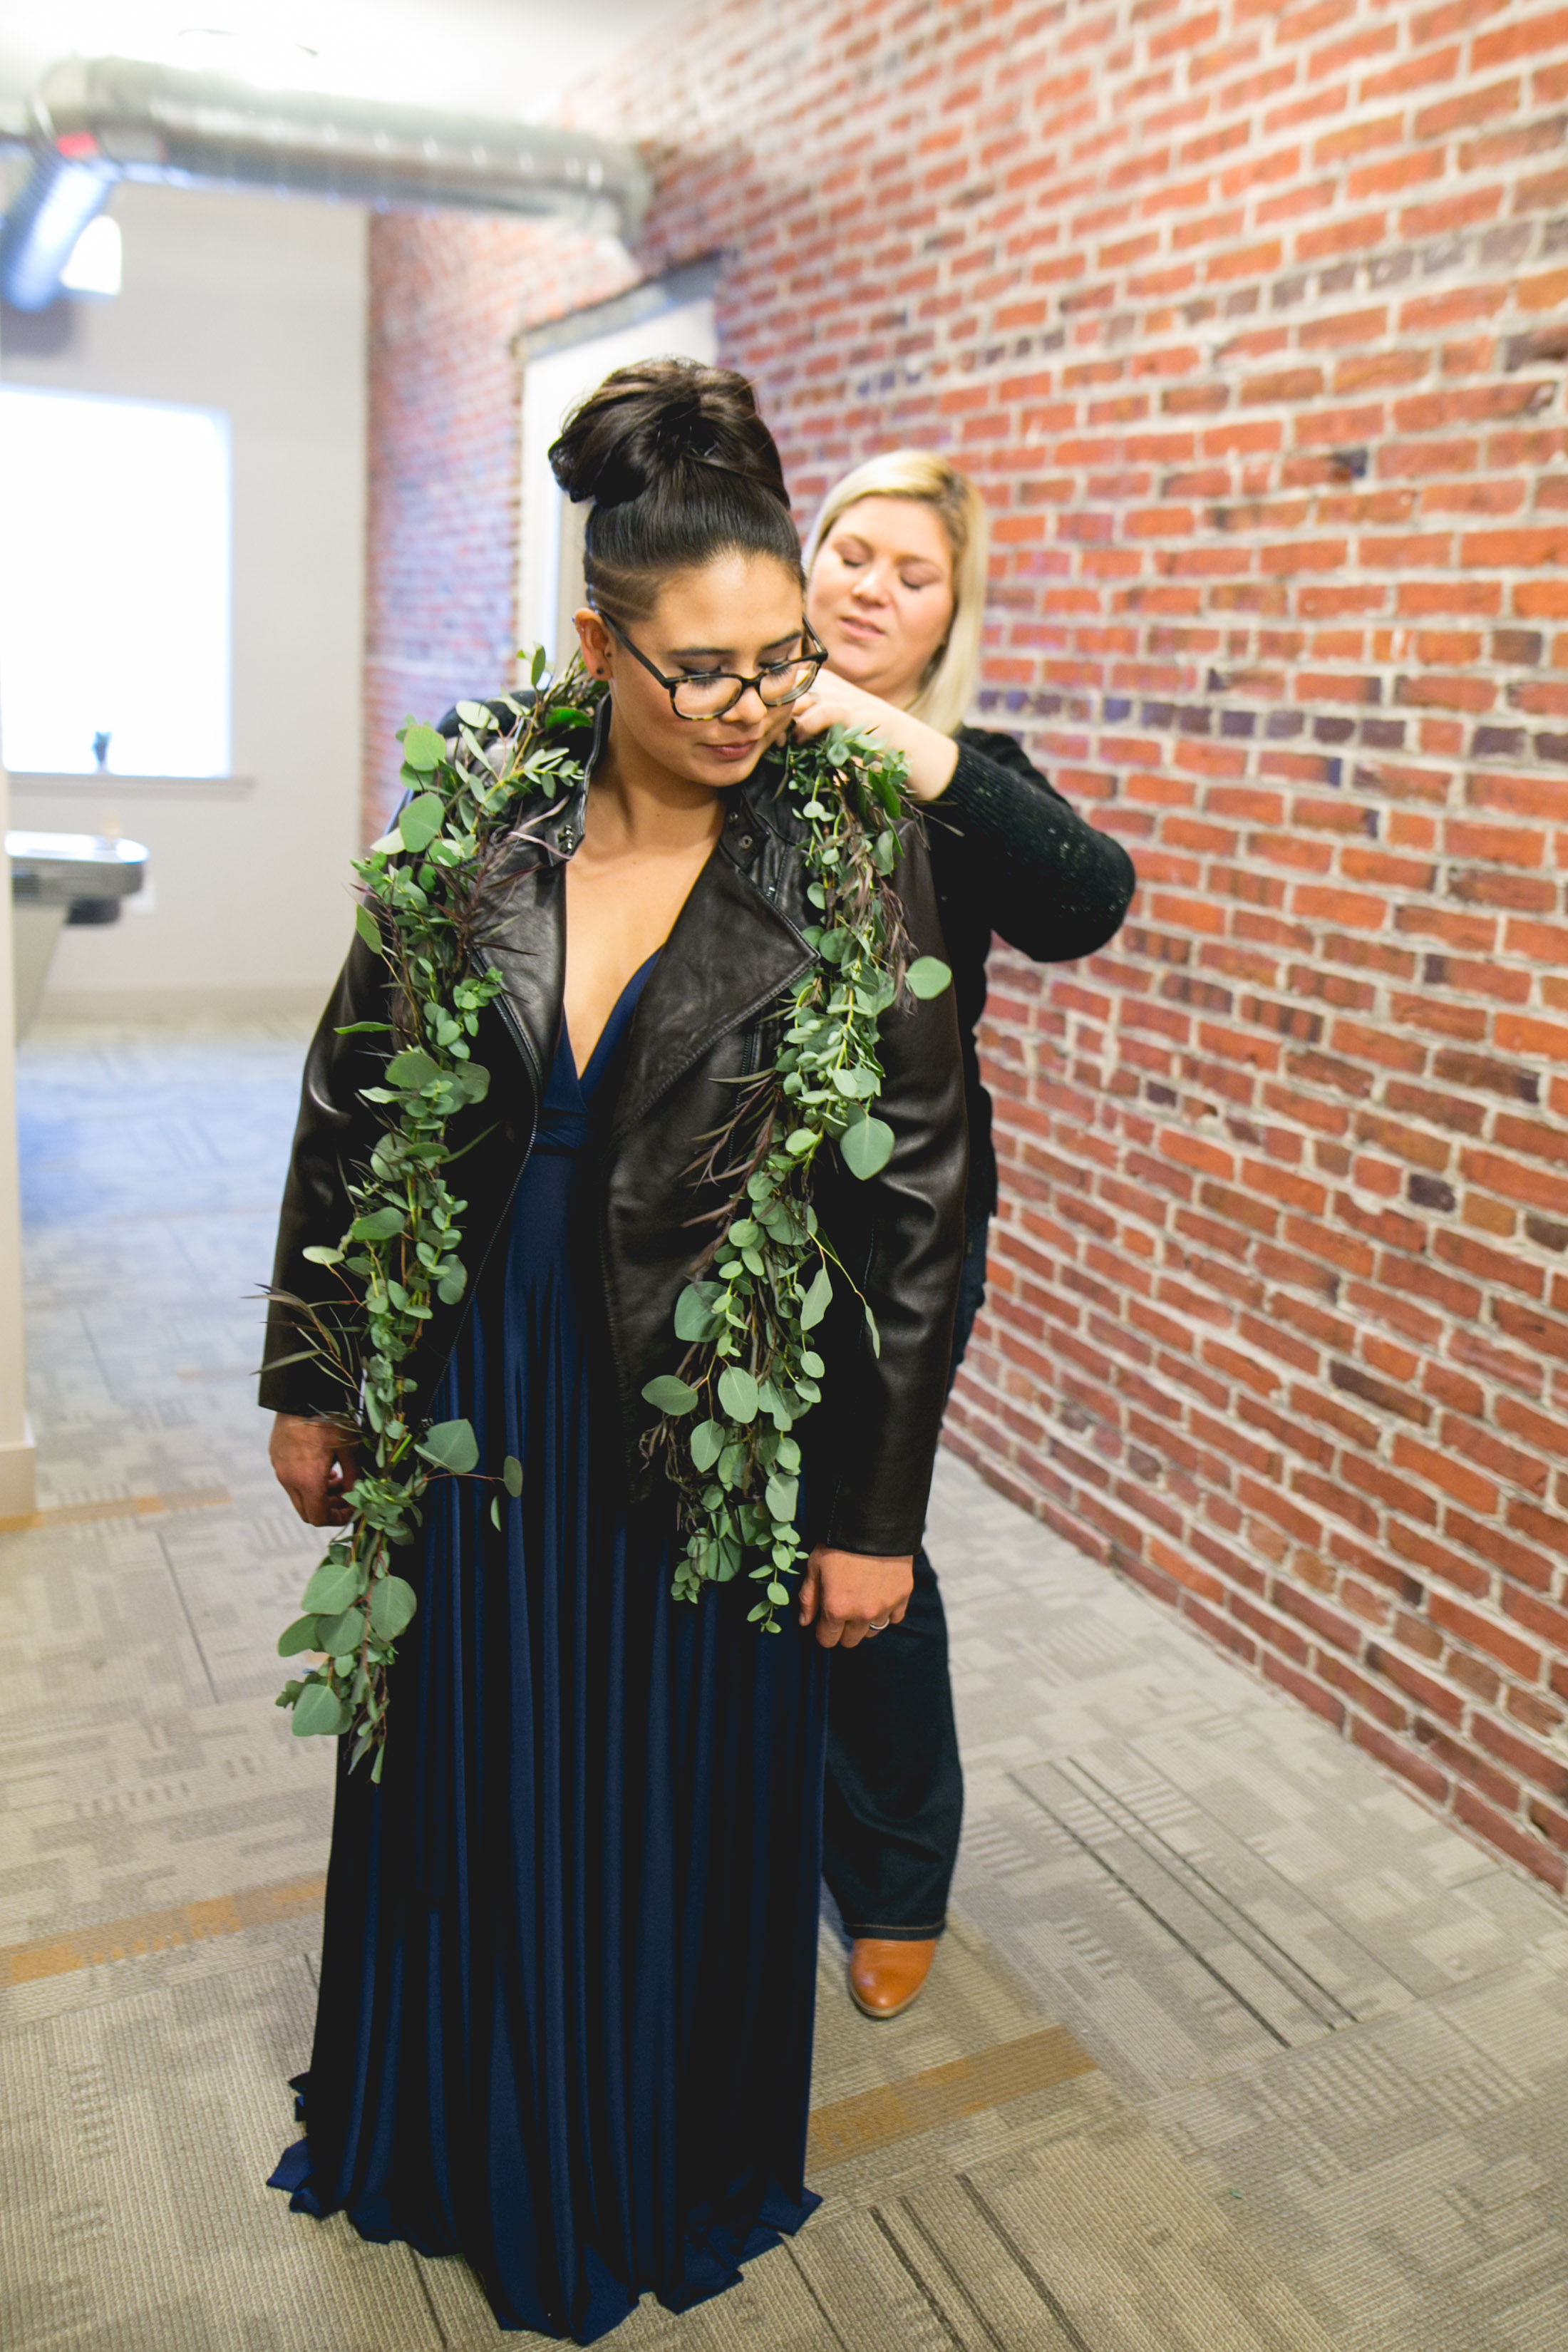 LGBTQ Philadelphia Wedding by Swiger Photography the Lesbian photographer 8